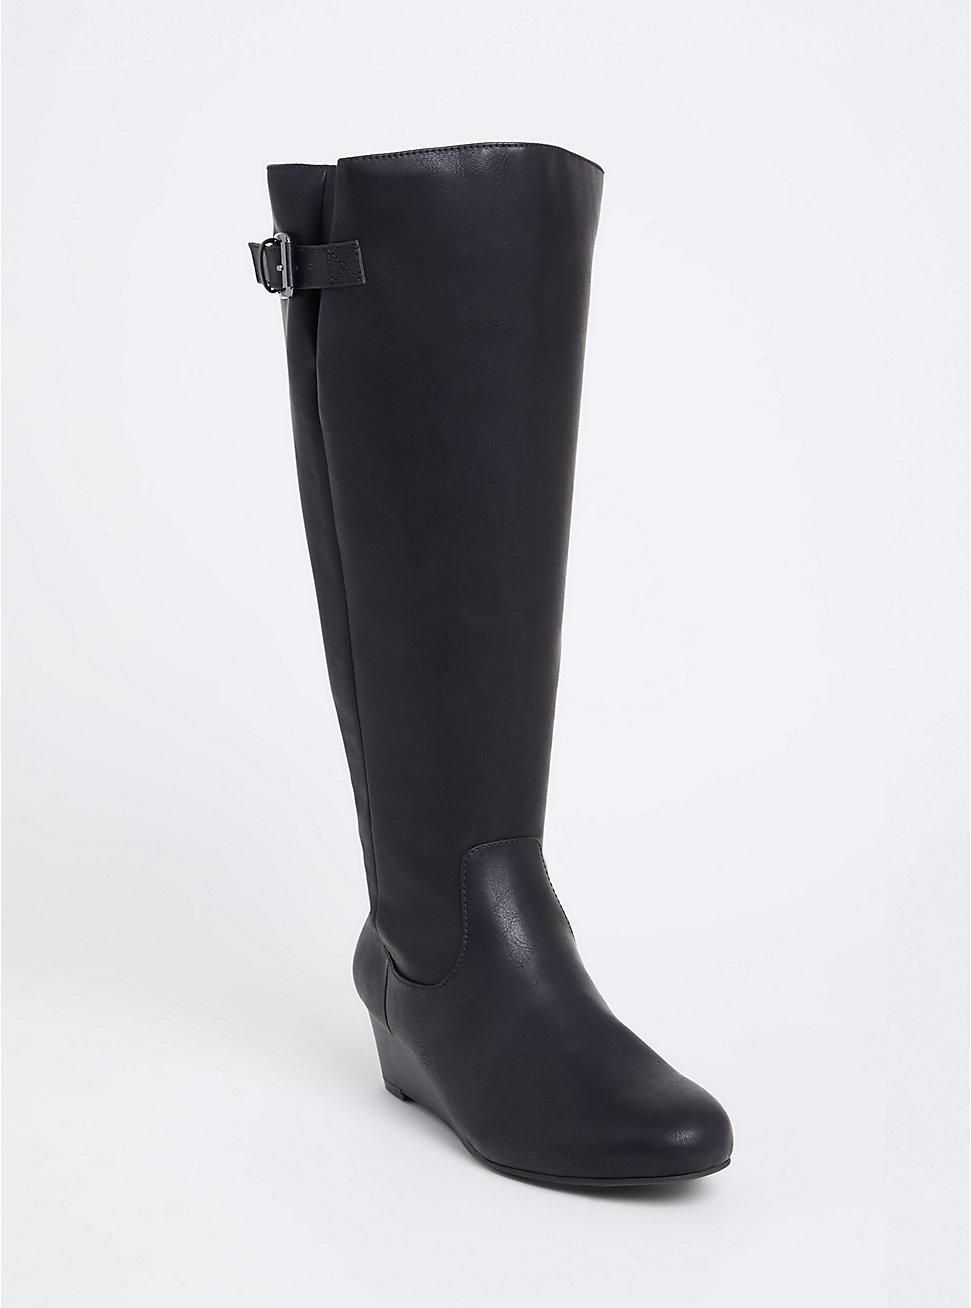 Torrid, boots